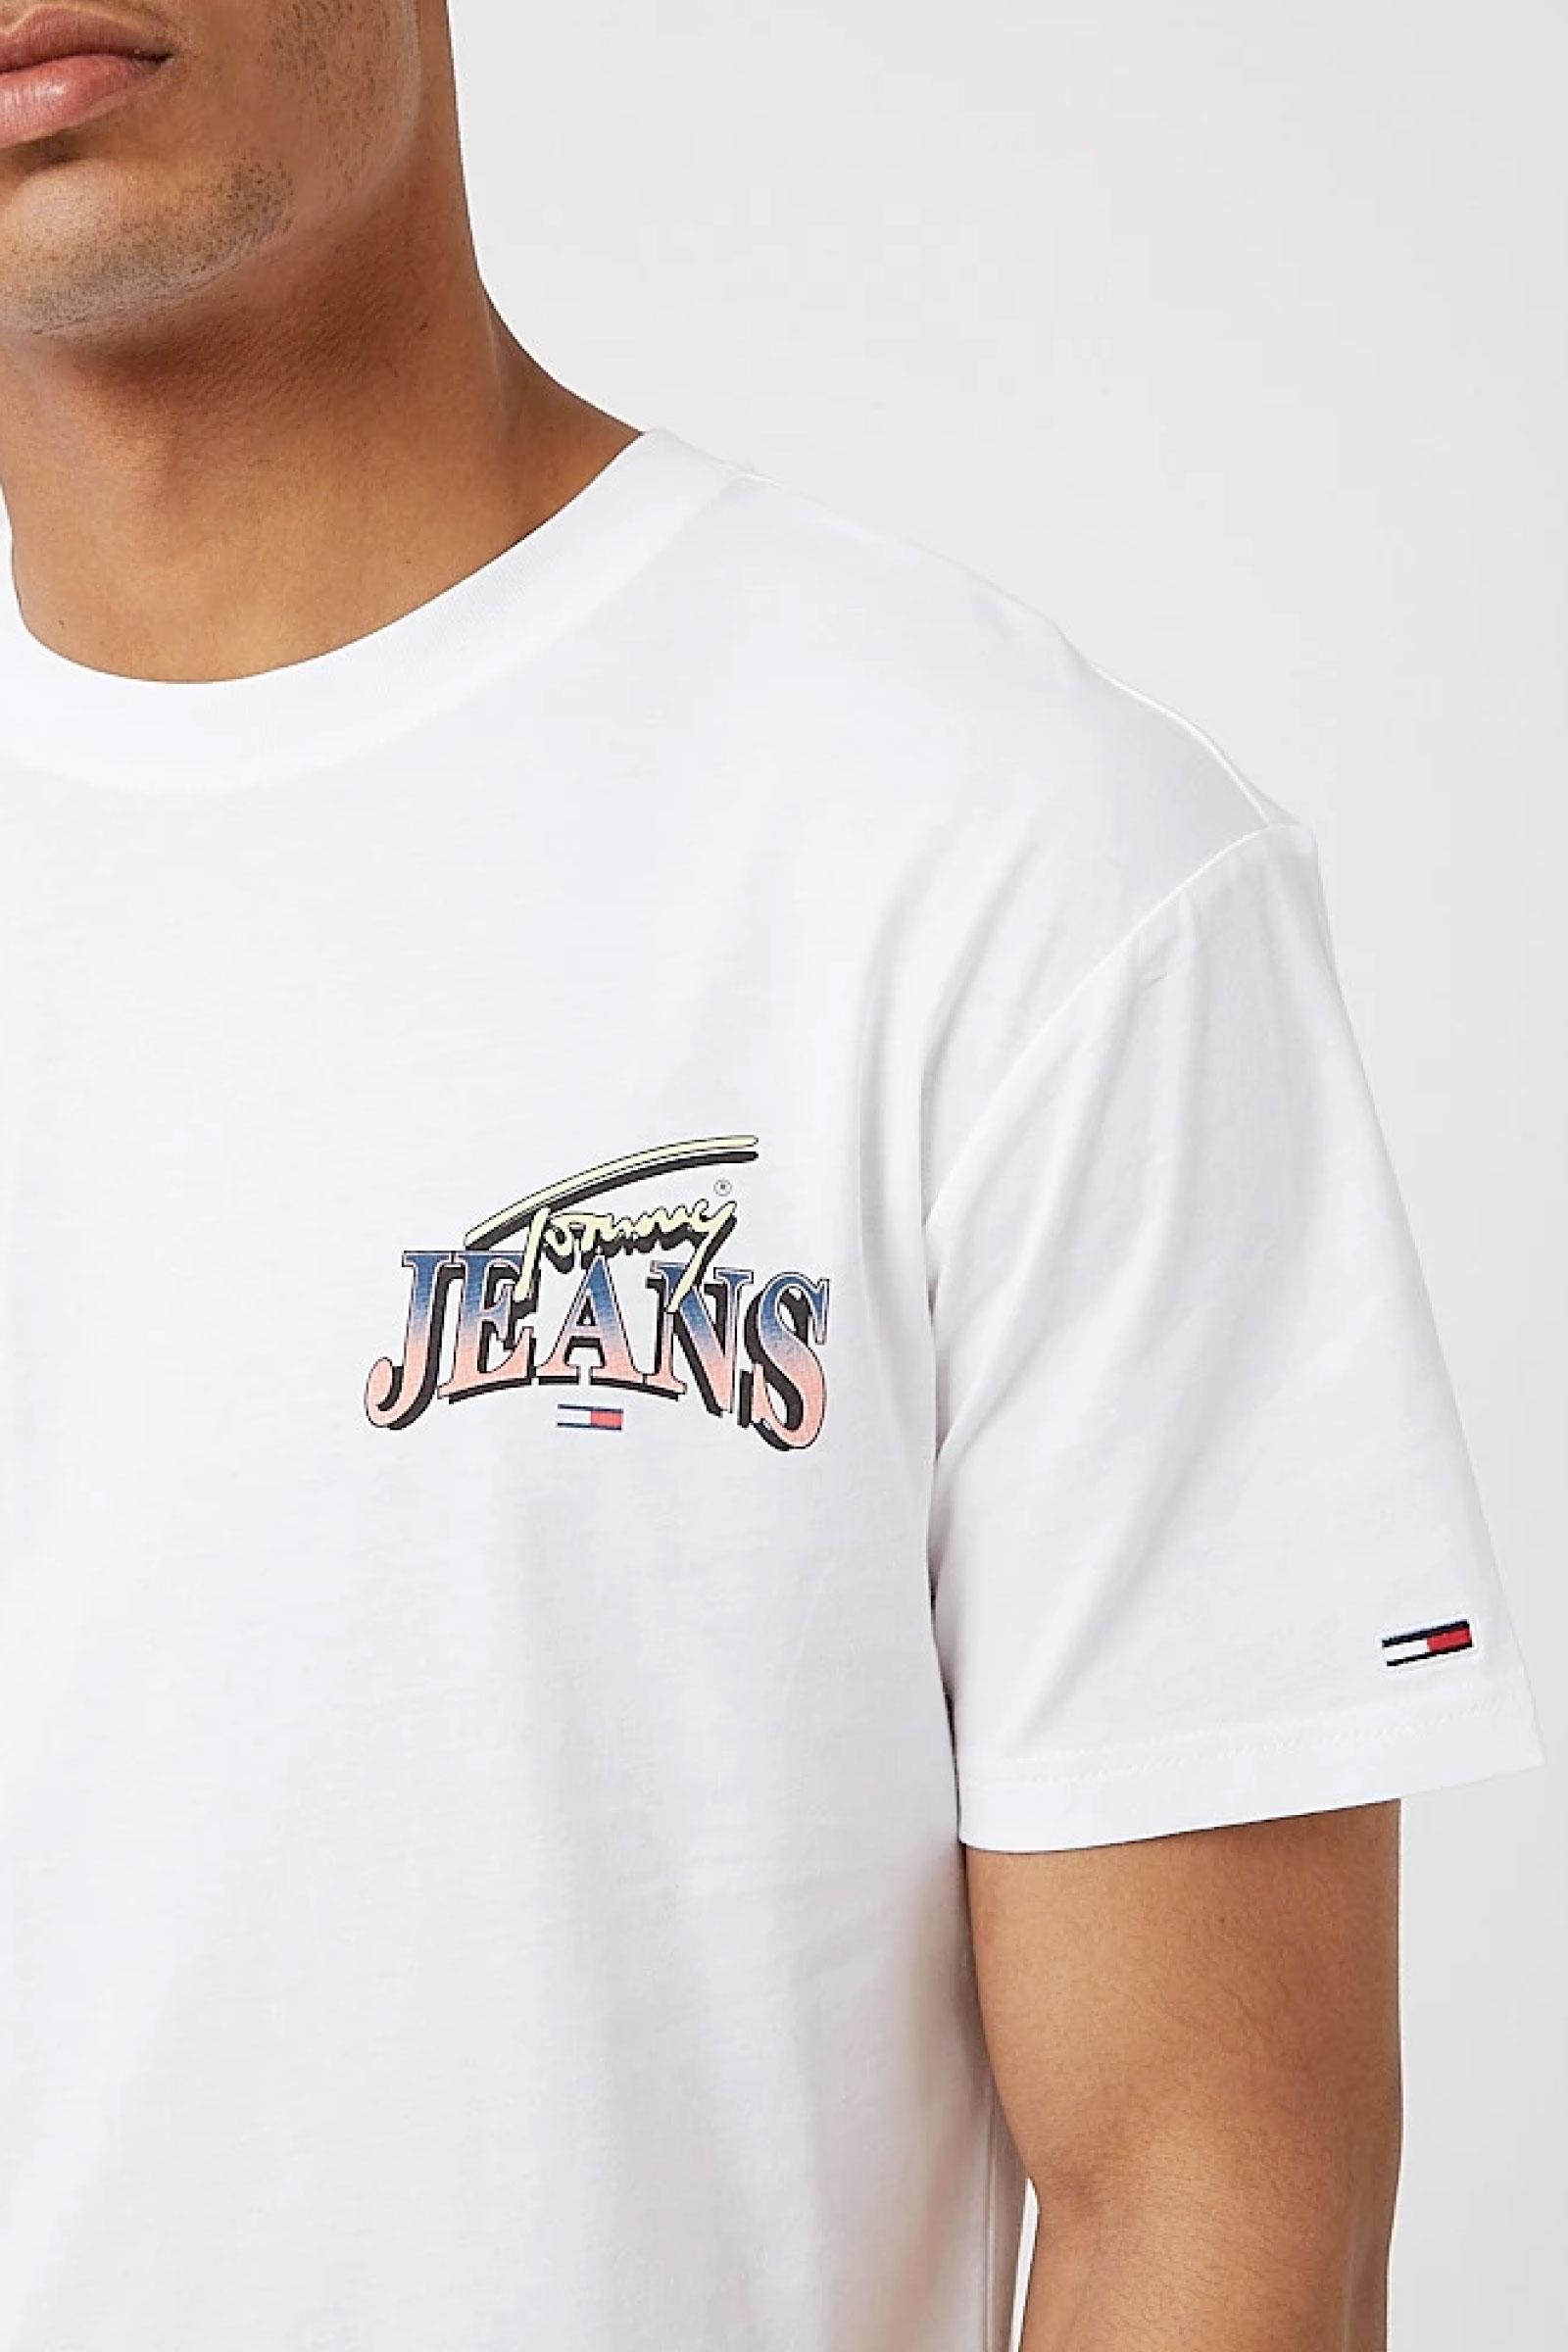 TOMMY JEANS | T-Shirt | DM0DM10622YBR